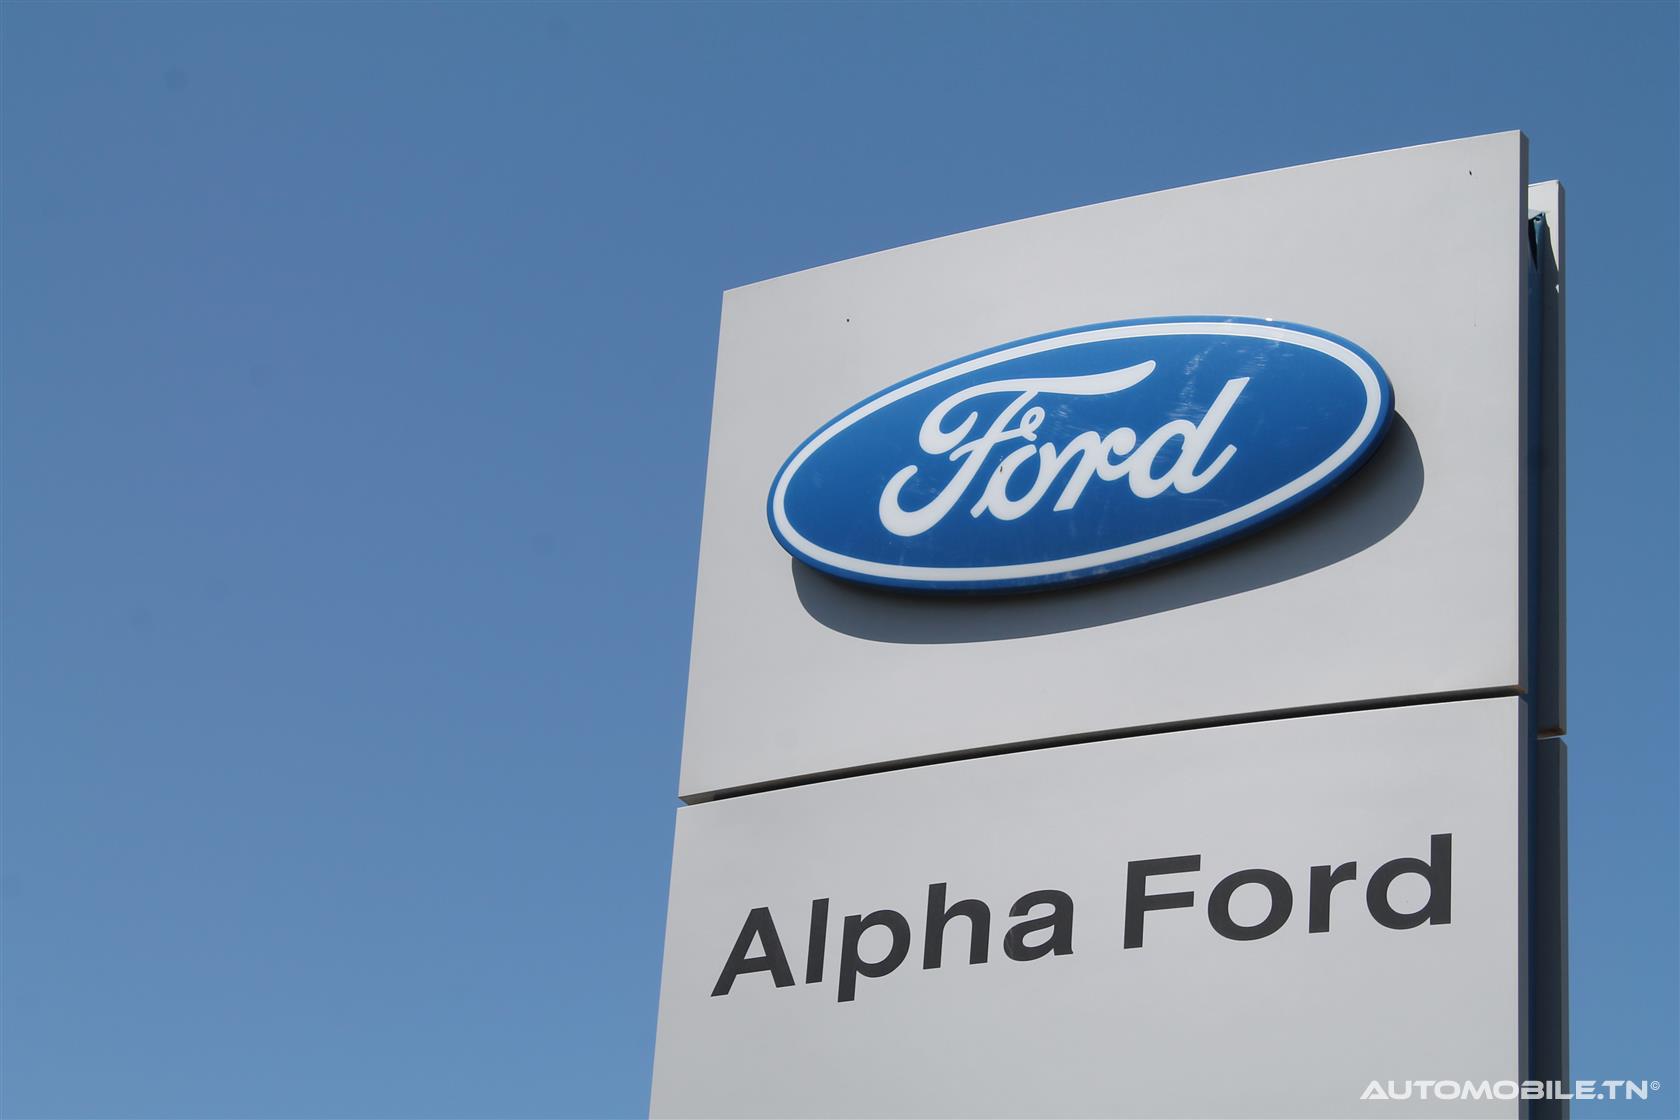 Cession d'Alpha Ford Tunisie : Le Consortium Ben Jemâa Motors, Salvador Caetano remporte l'appel d'offres